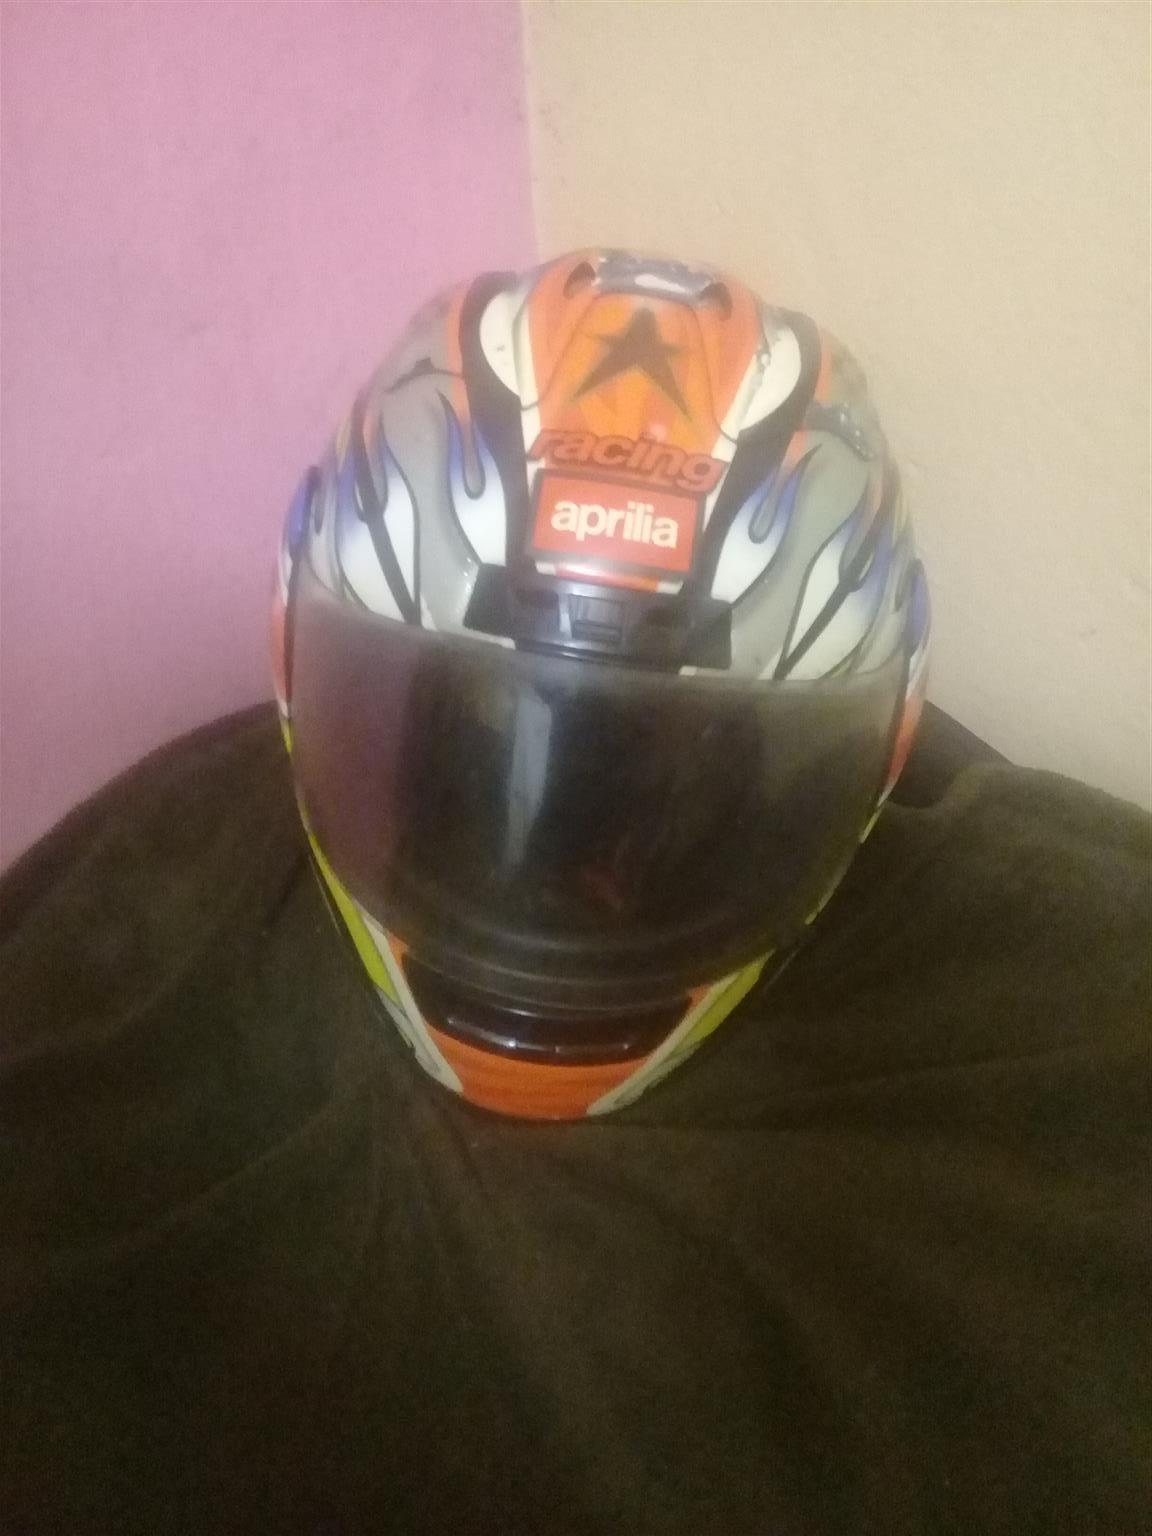 Aprilia Helmet for sale.